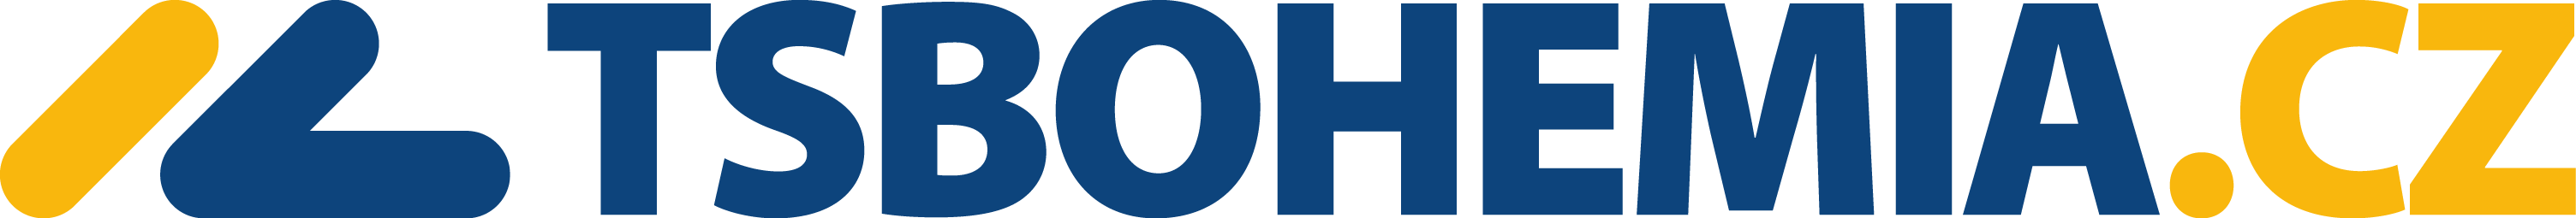 ts bohemia logo